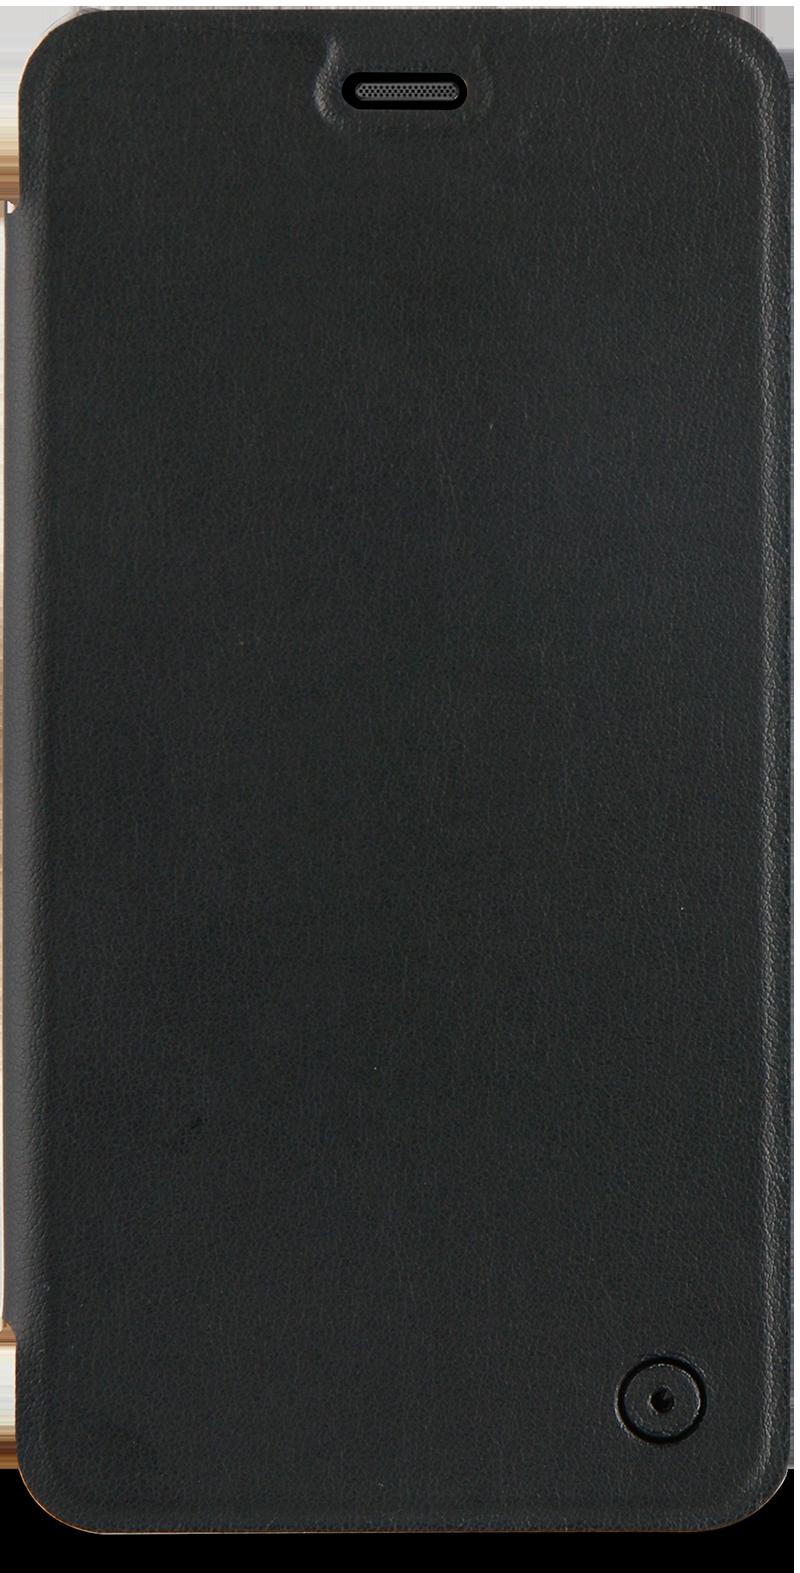 Etui folio Huawei P10 lite noir